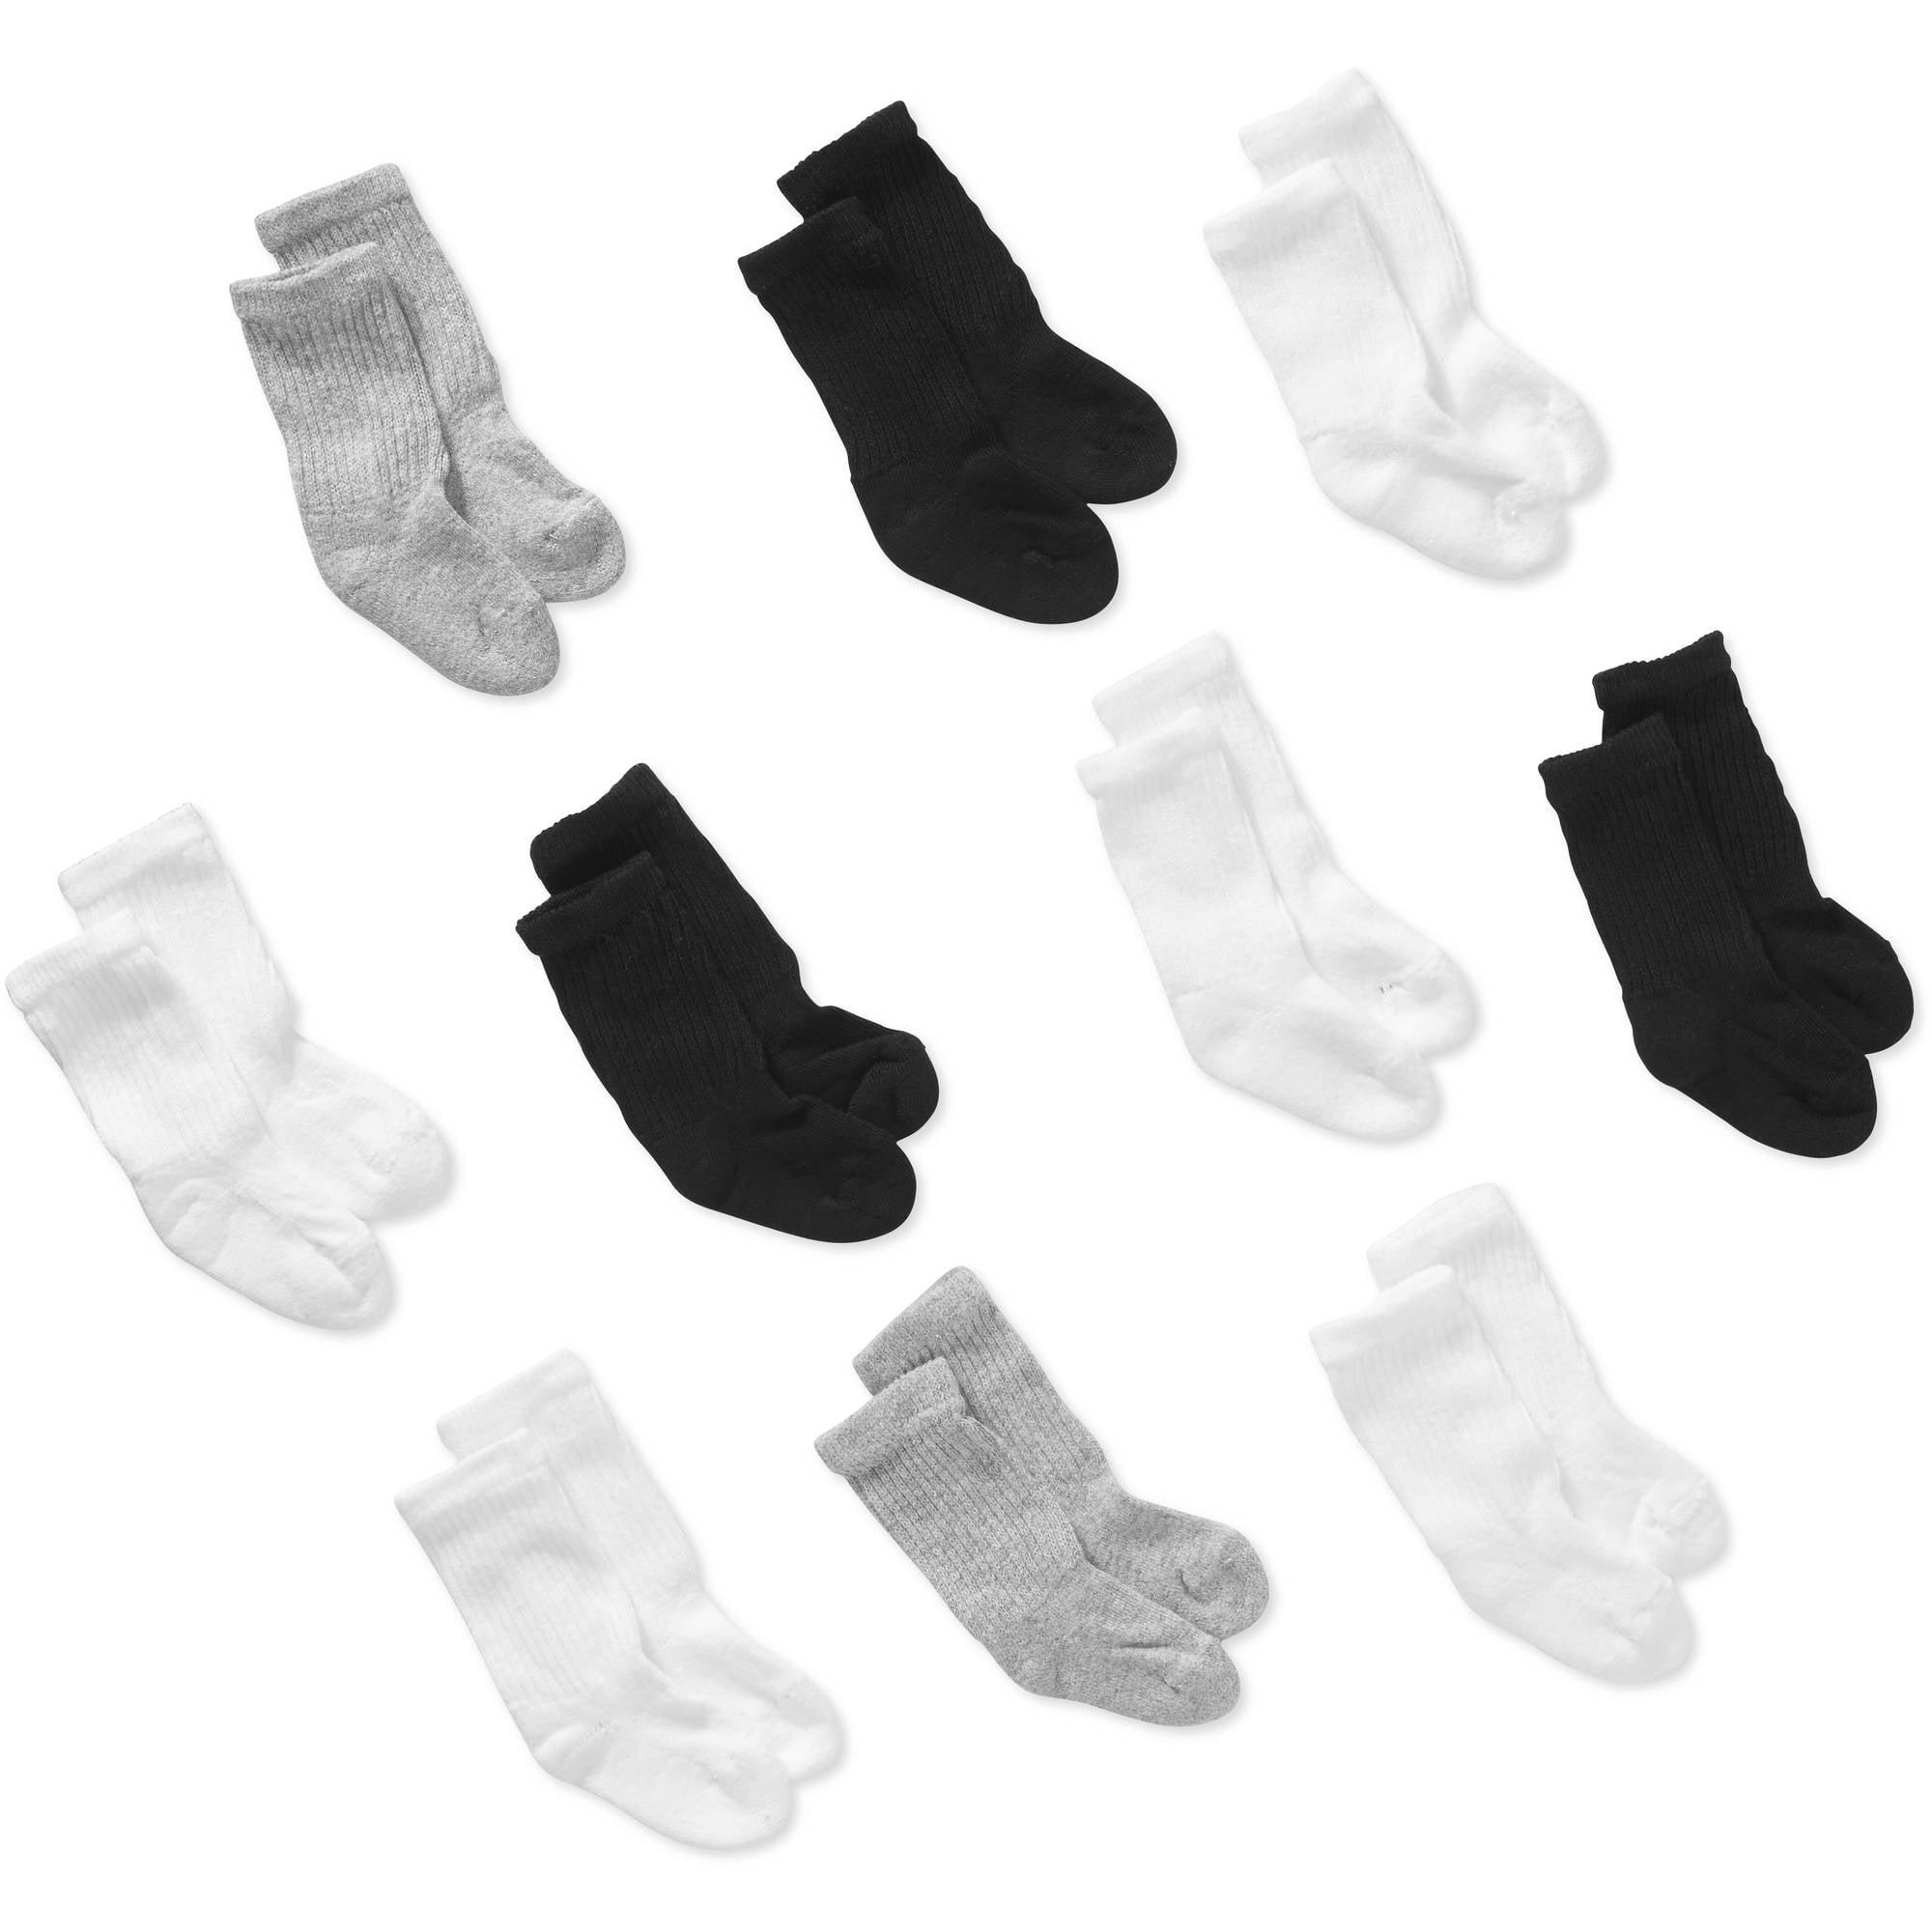 Garanimals Assorted Baby/Toddler Unisex Crew Socks, 10-pack